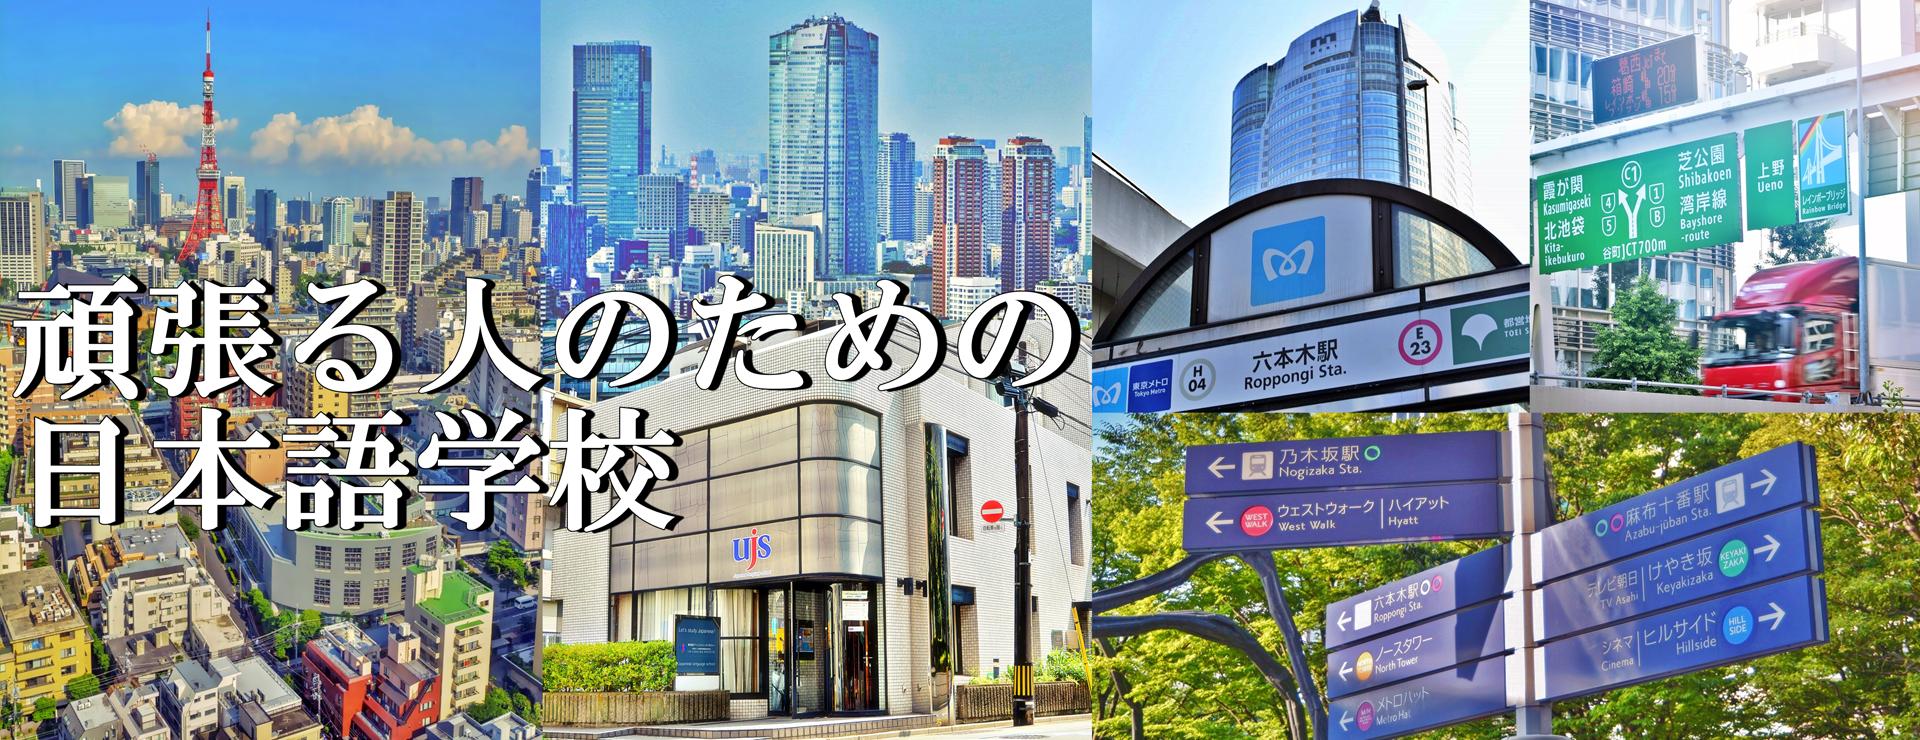 UJS日本語学校